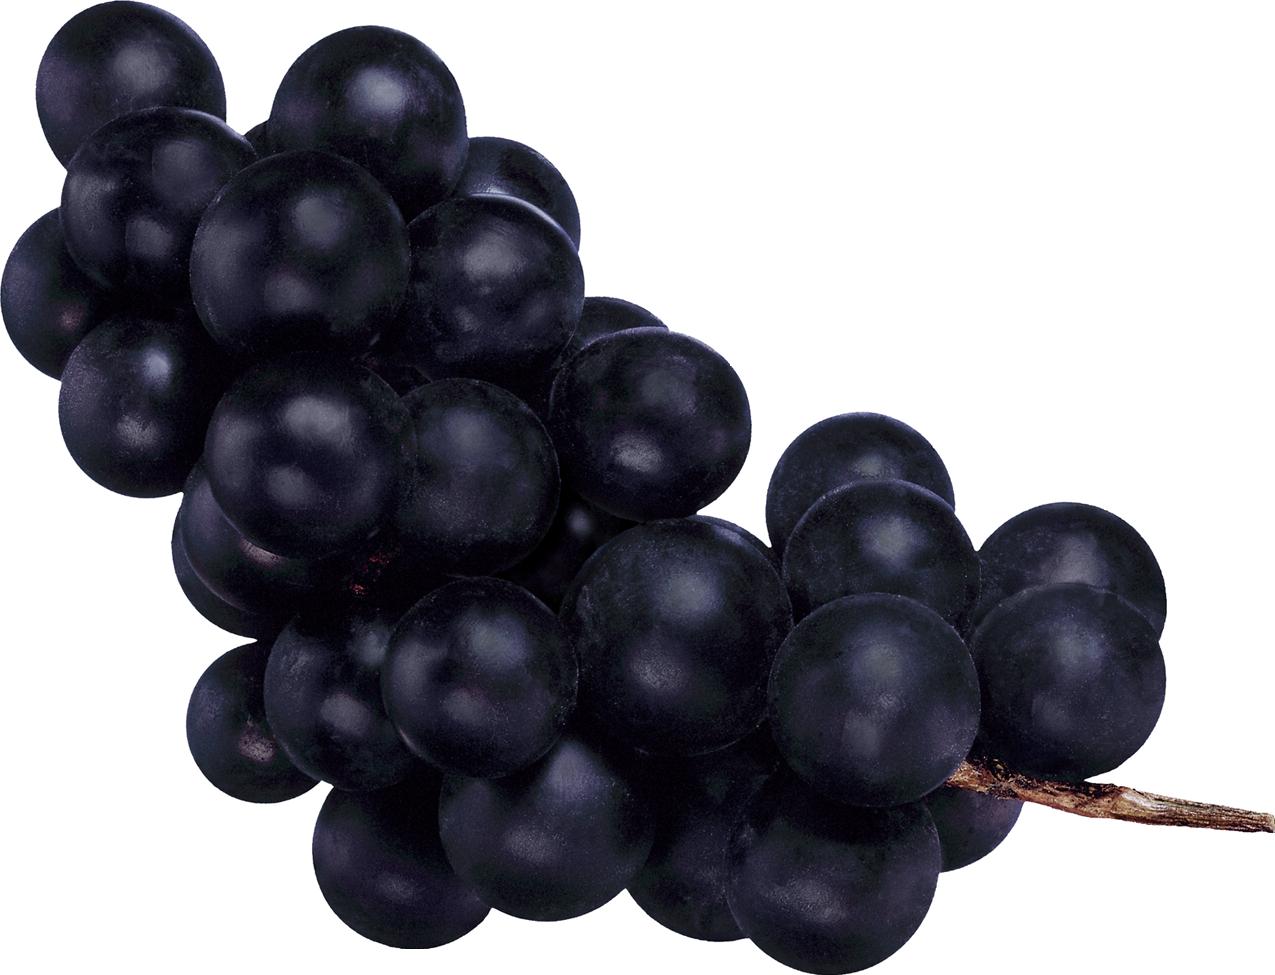 Black png image purepng. Grapes clipart ten